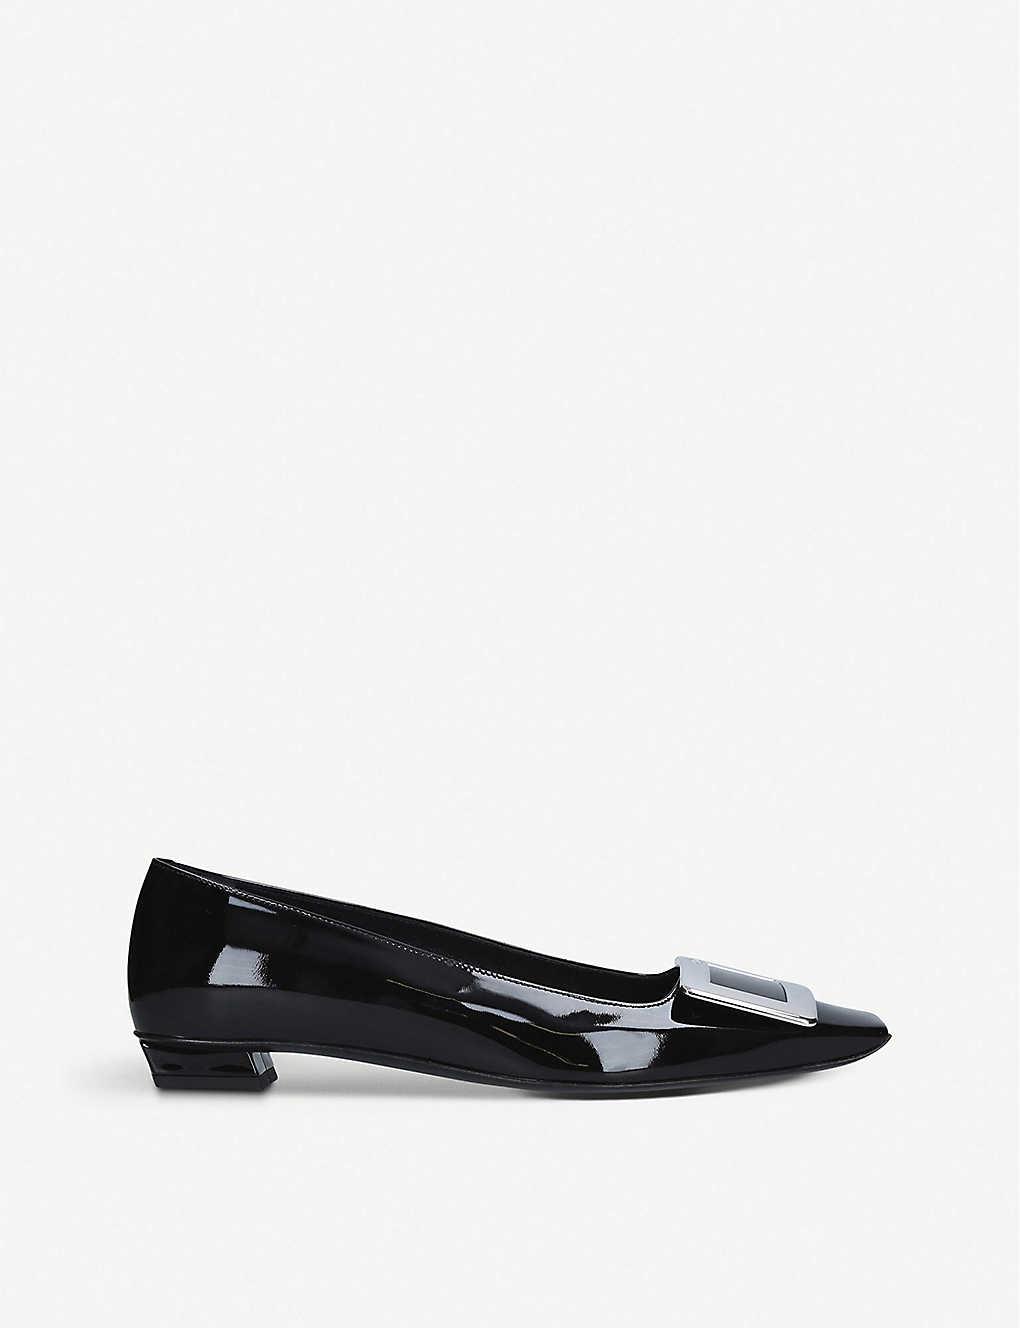 Belle Vivier patent-leather ballerina flats(2813165)